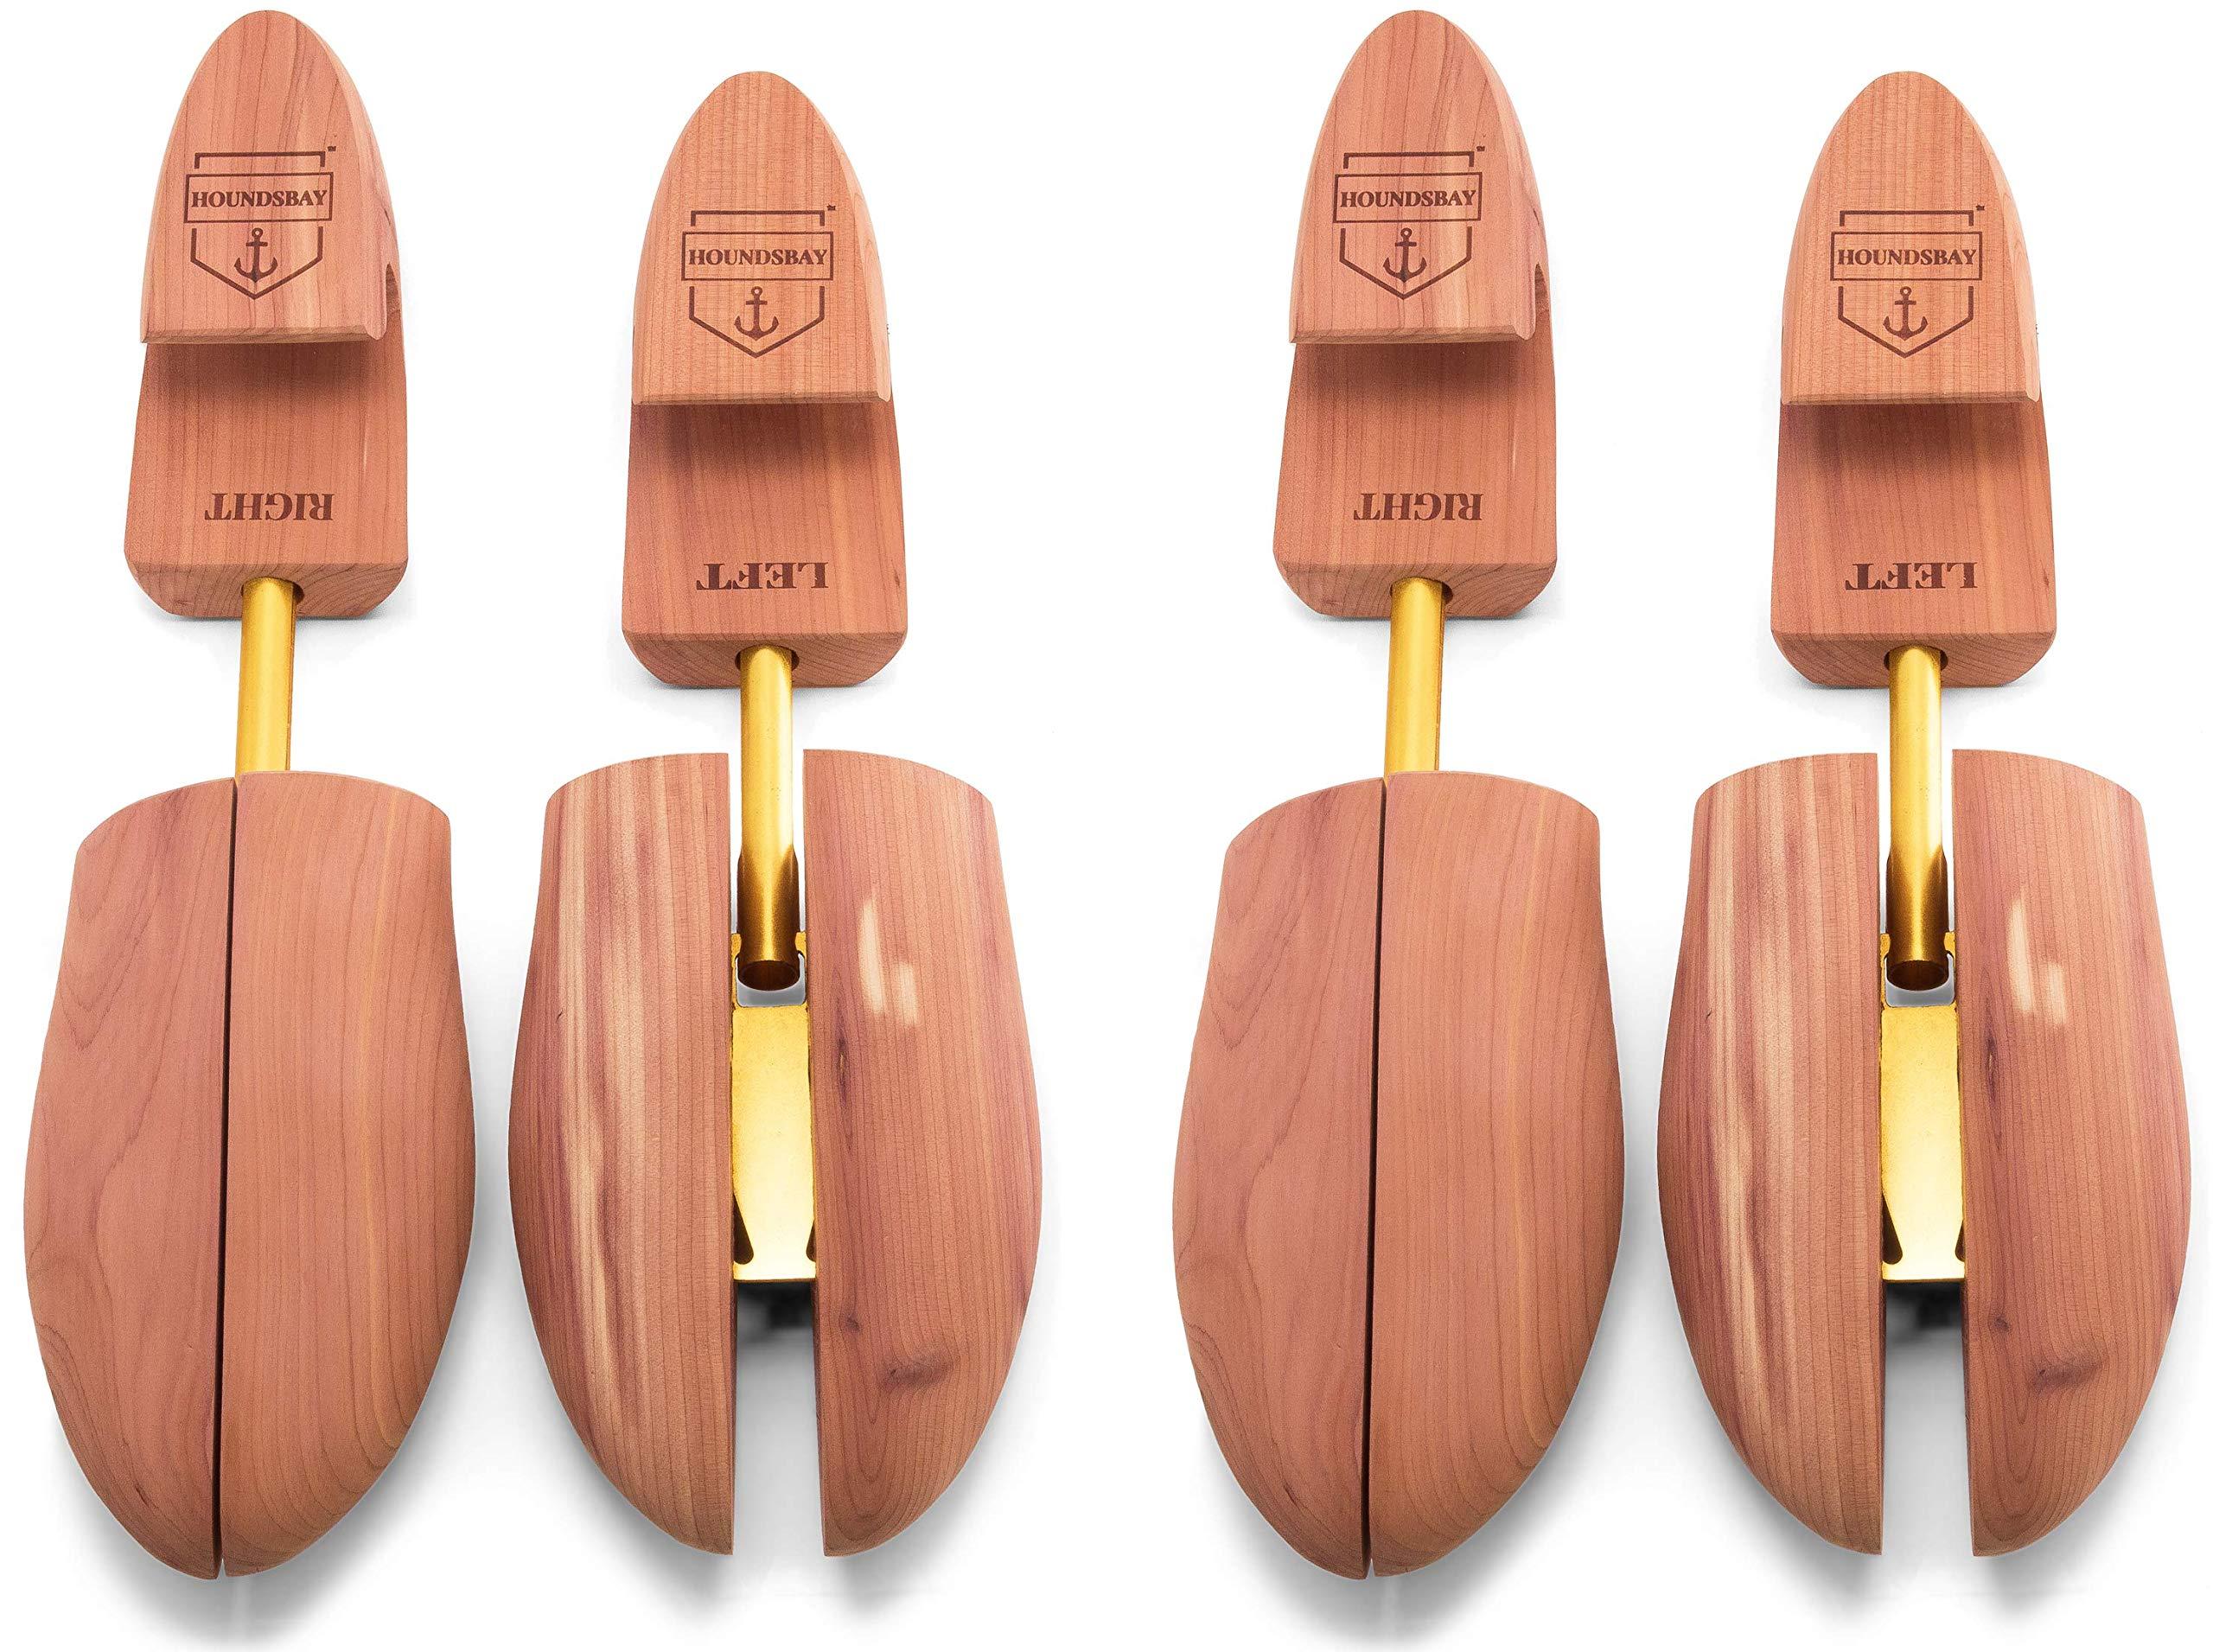 Hormas de Cedro para Zapatos de Hombre HOUNDSBAY [2 Pares]